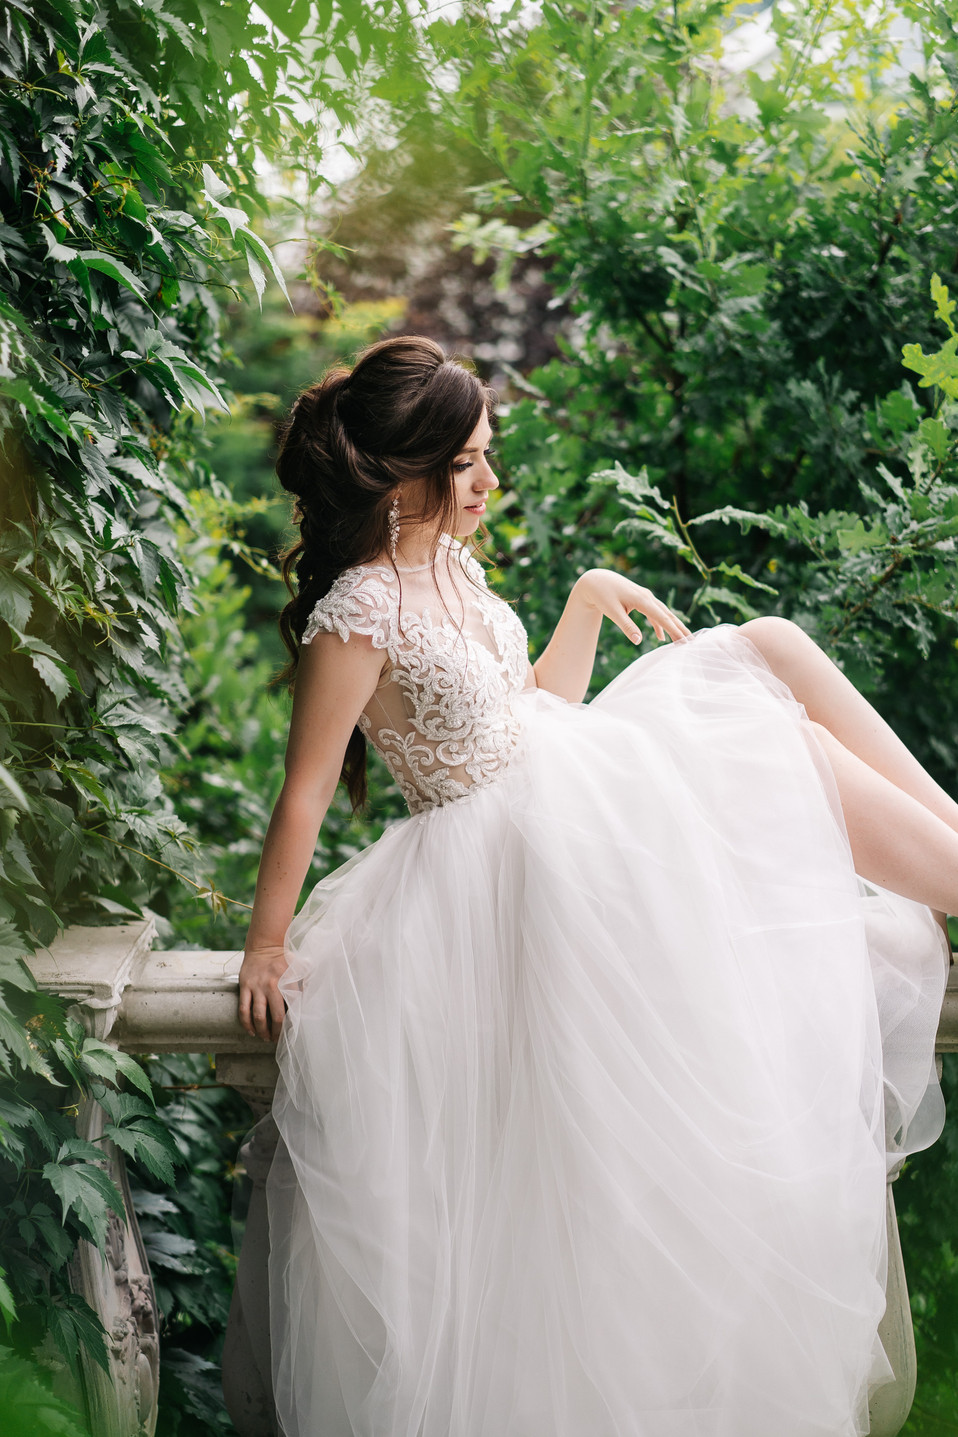 ArtSoul_Wedding_anons-26.jpg